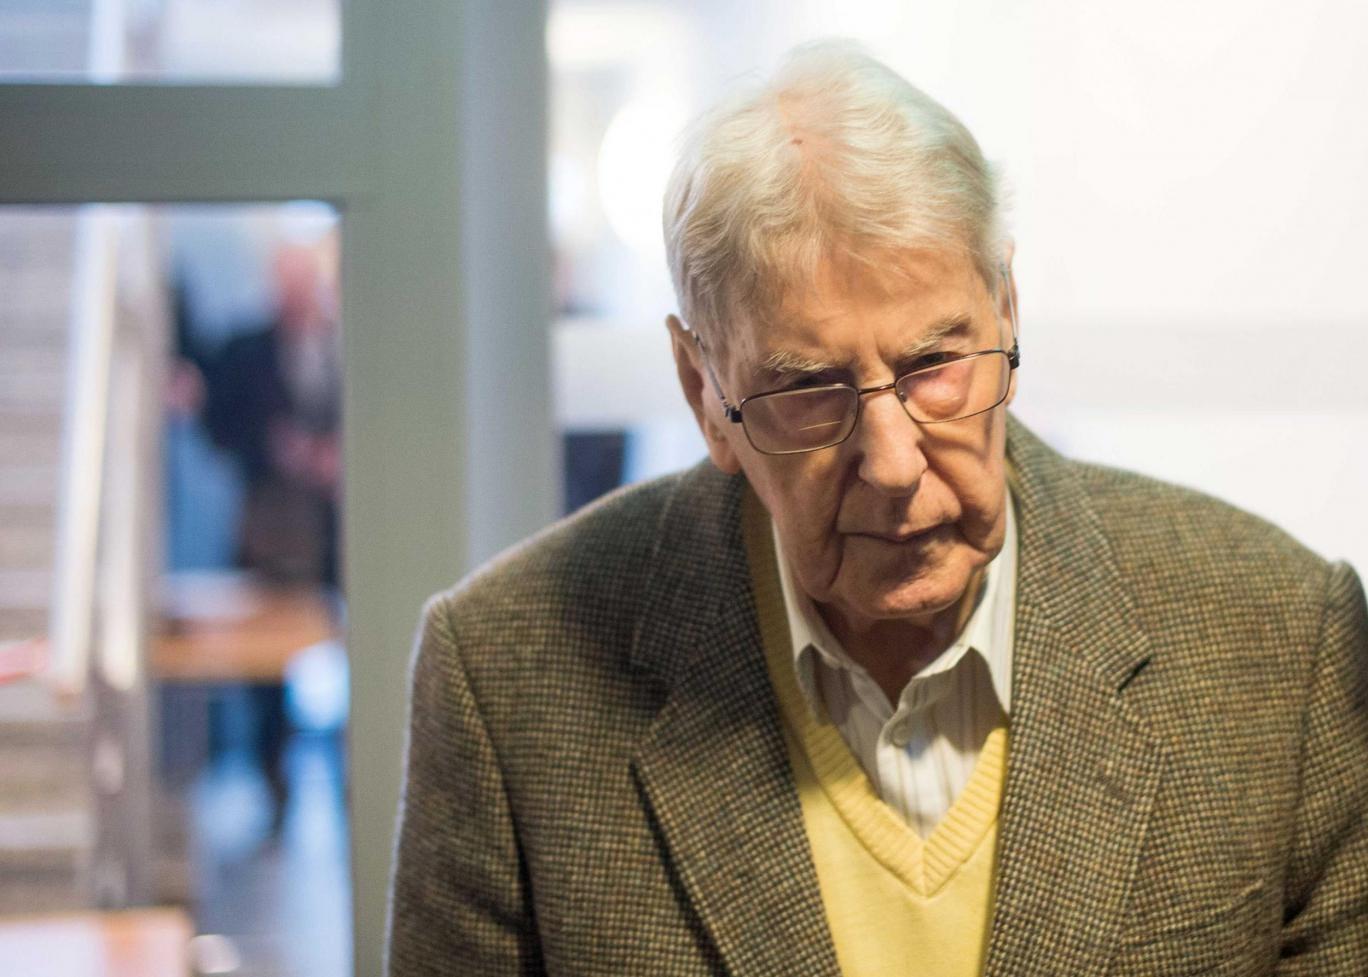 Holocaust survivor Justin Sonder reveals horrors of